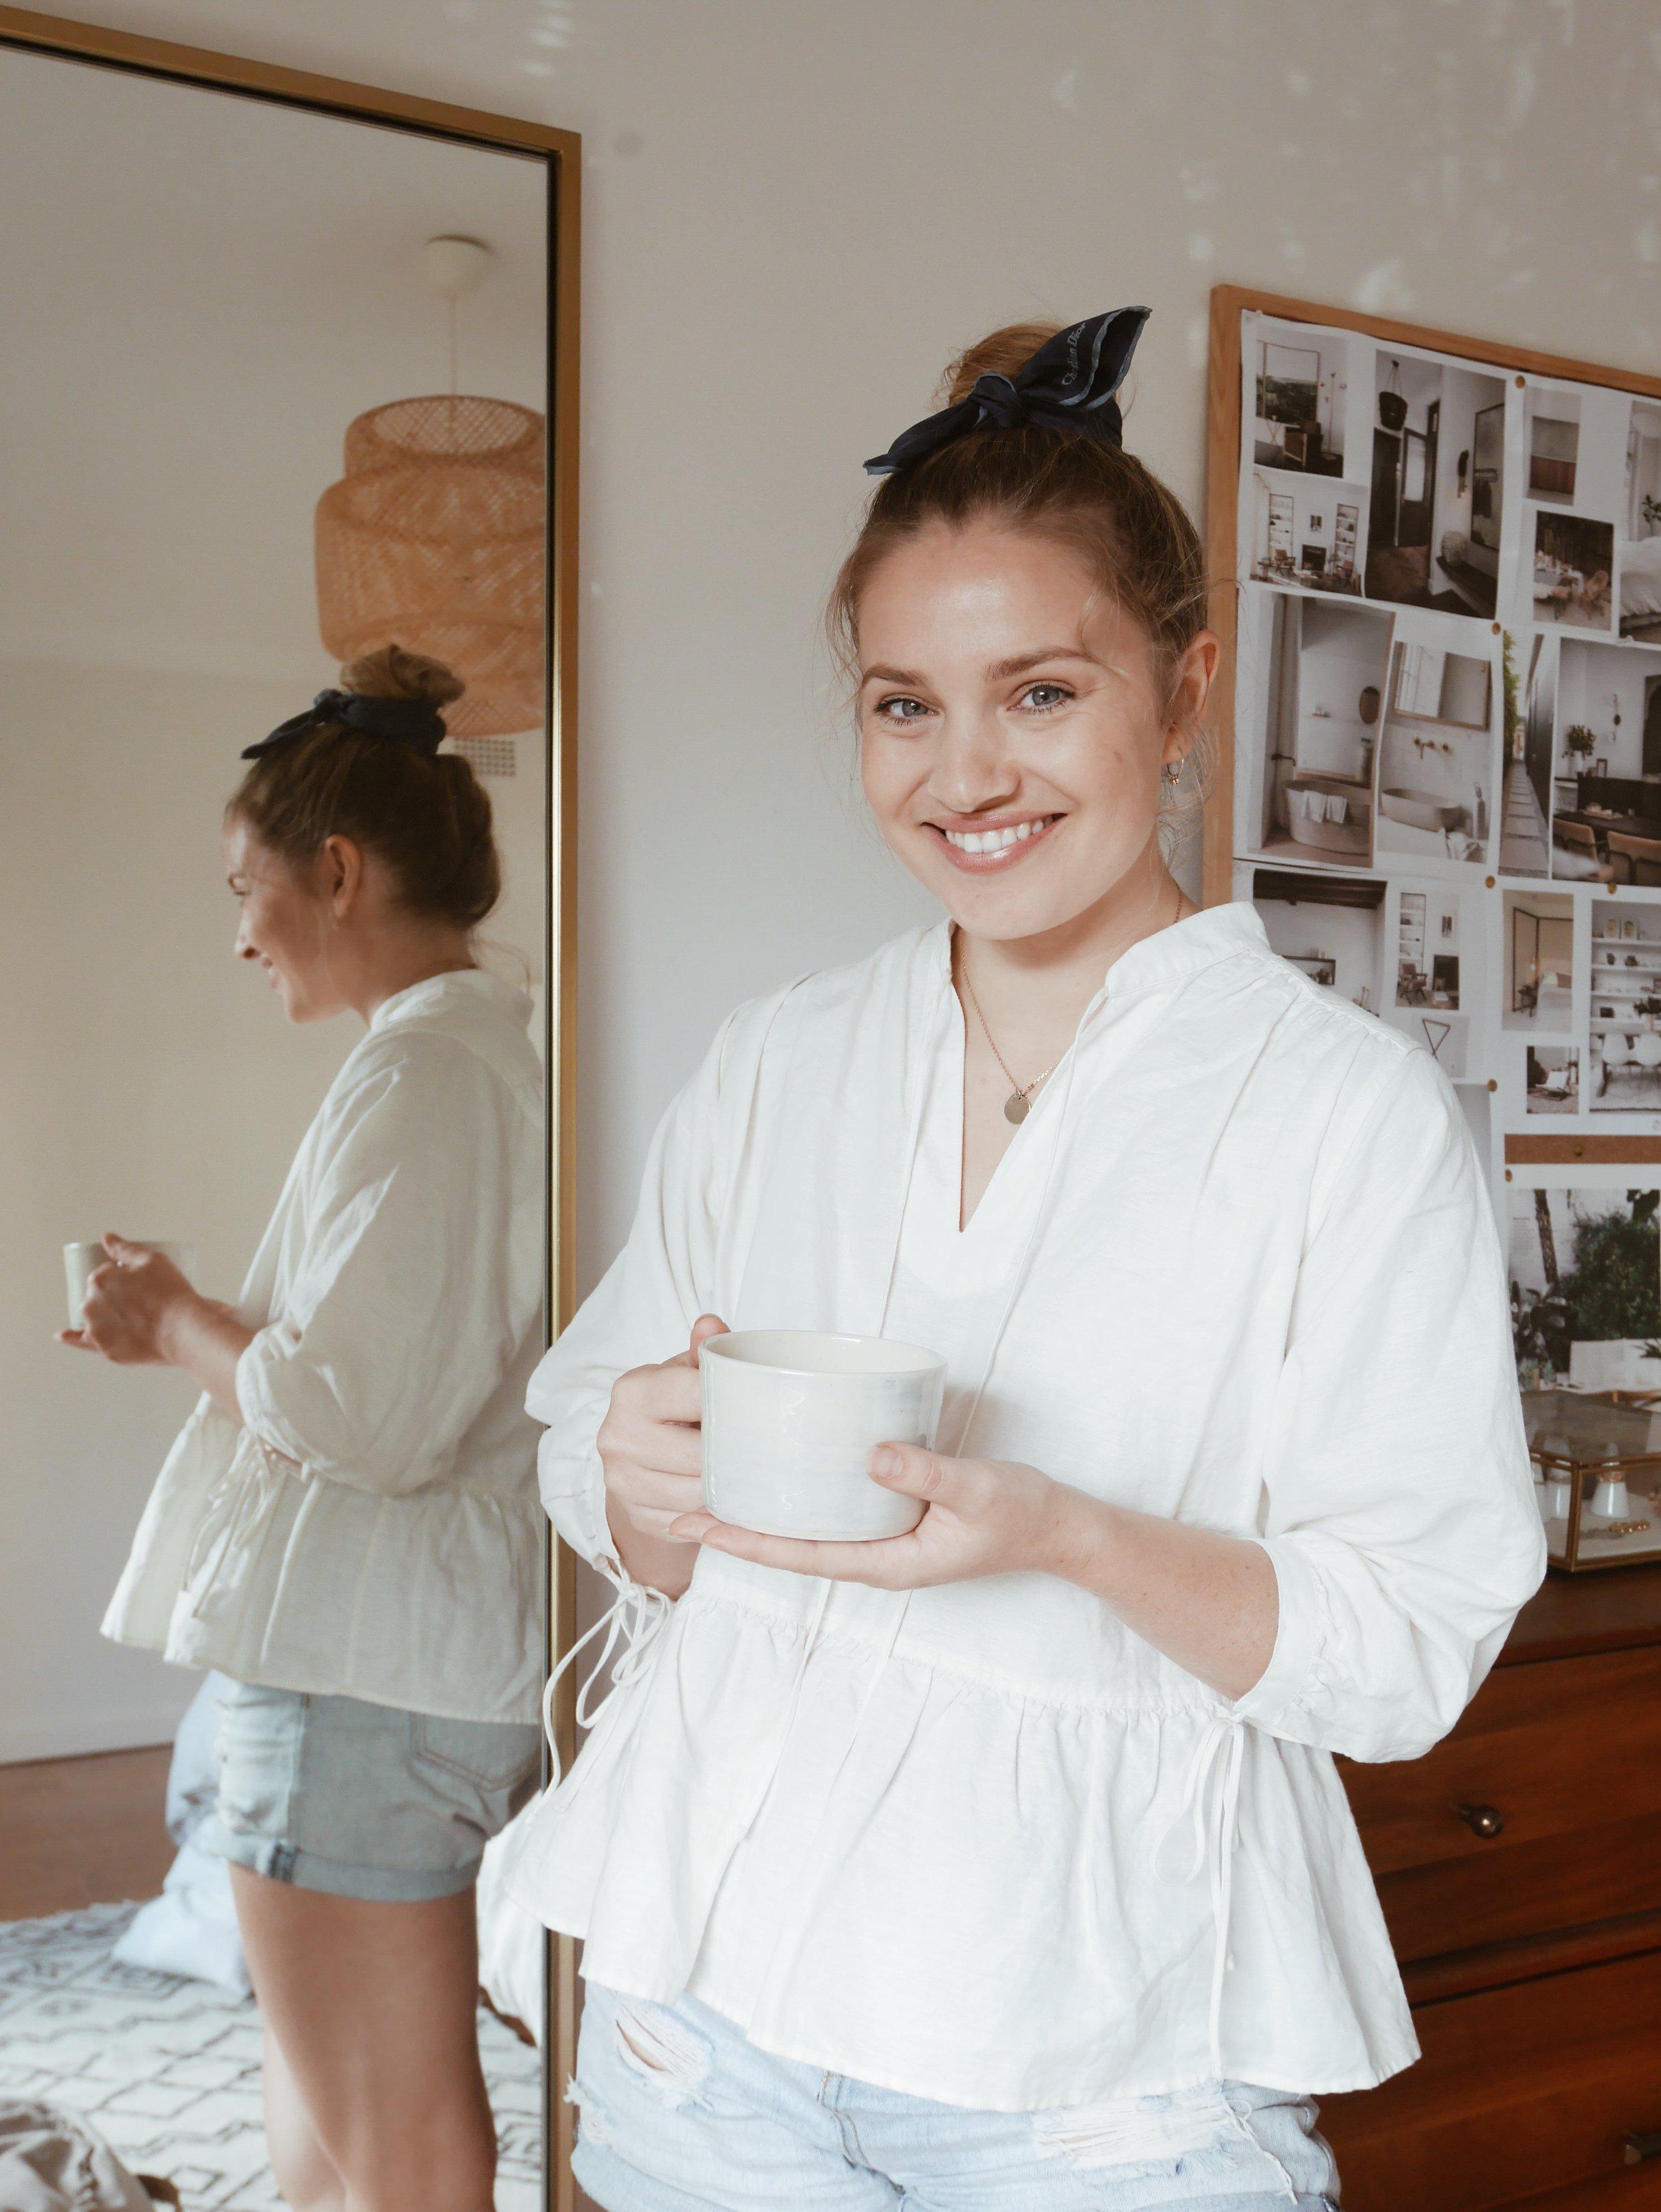 monique llewellyn holistic luxe living editor.JPG